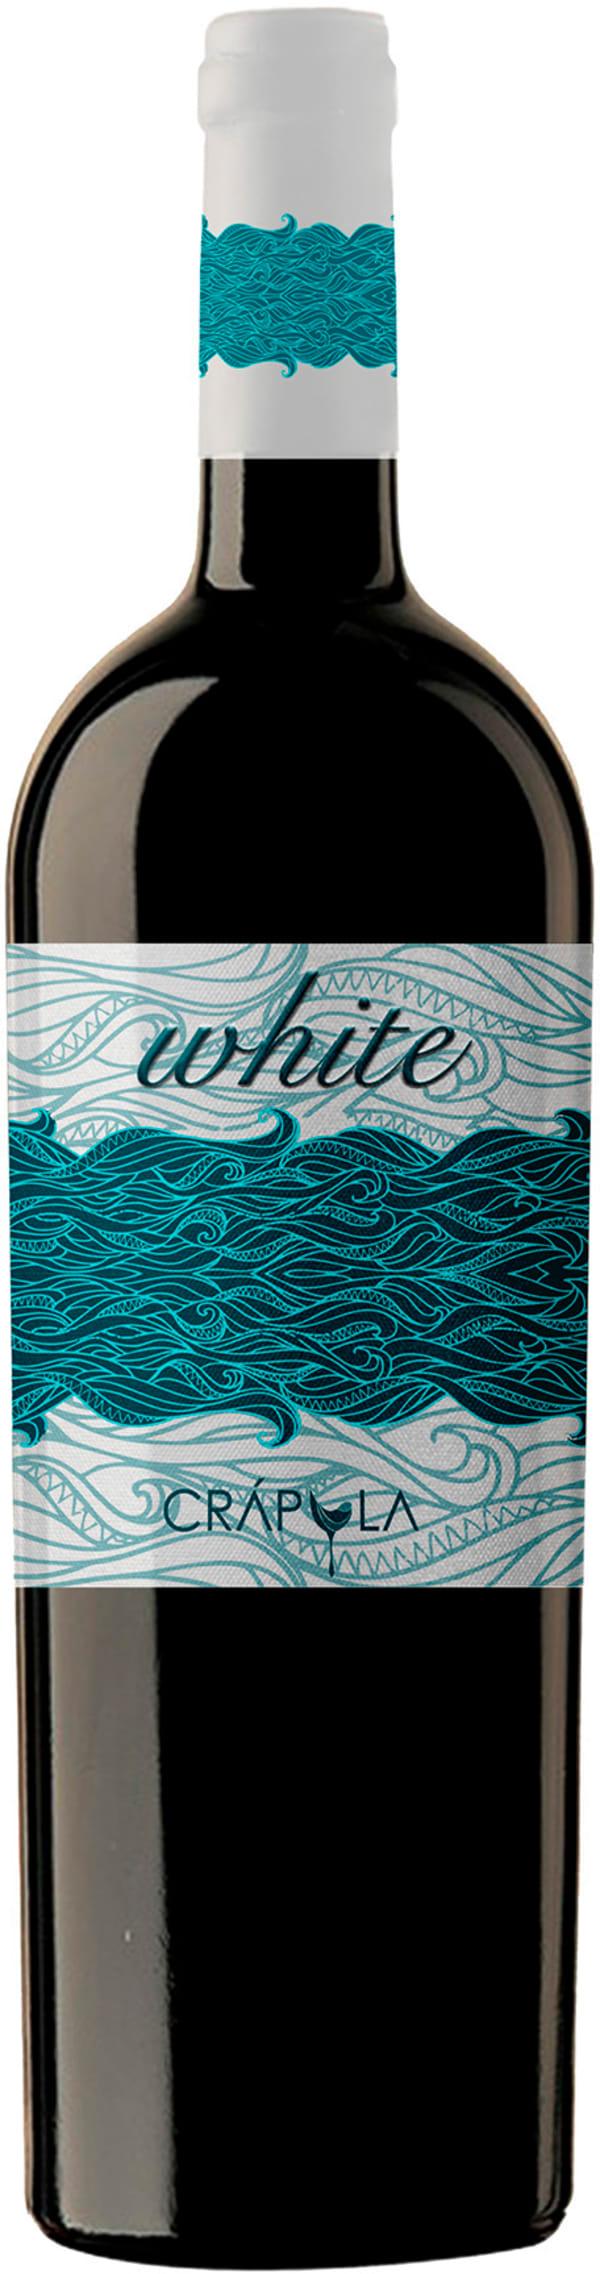 Crápula White Sauvignon Blanc 2018